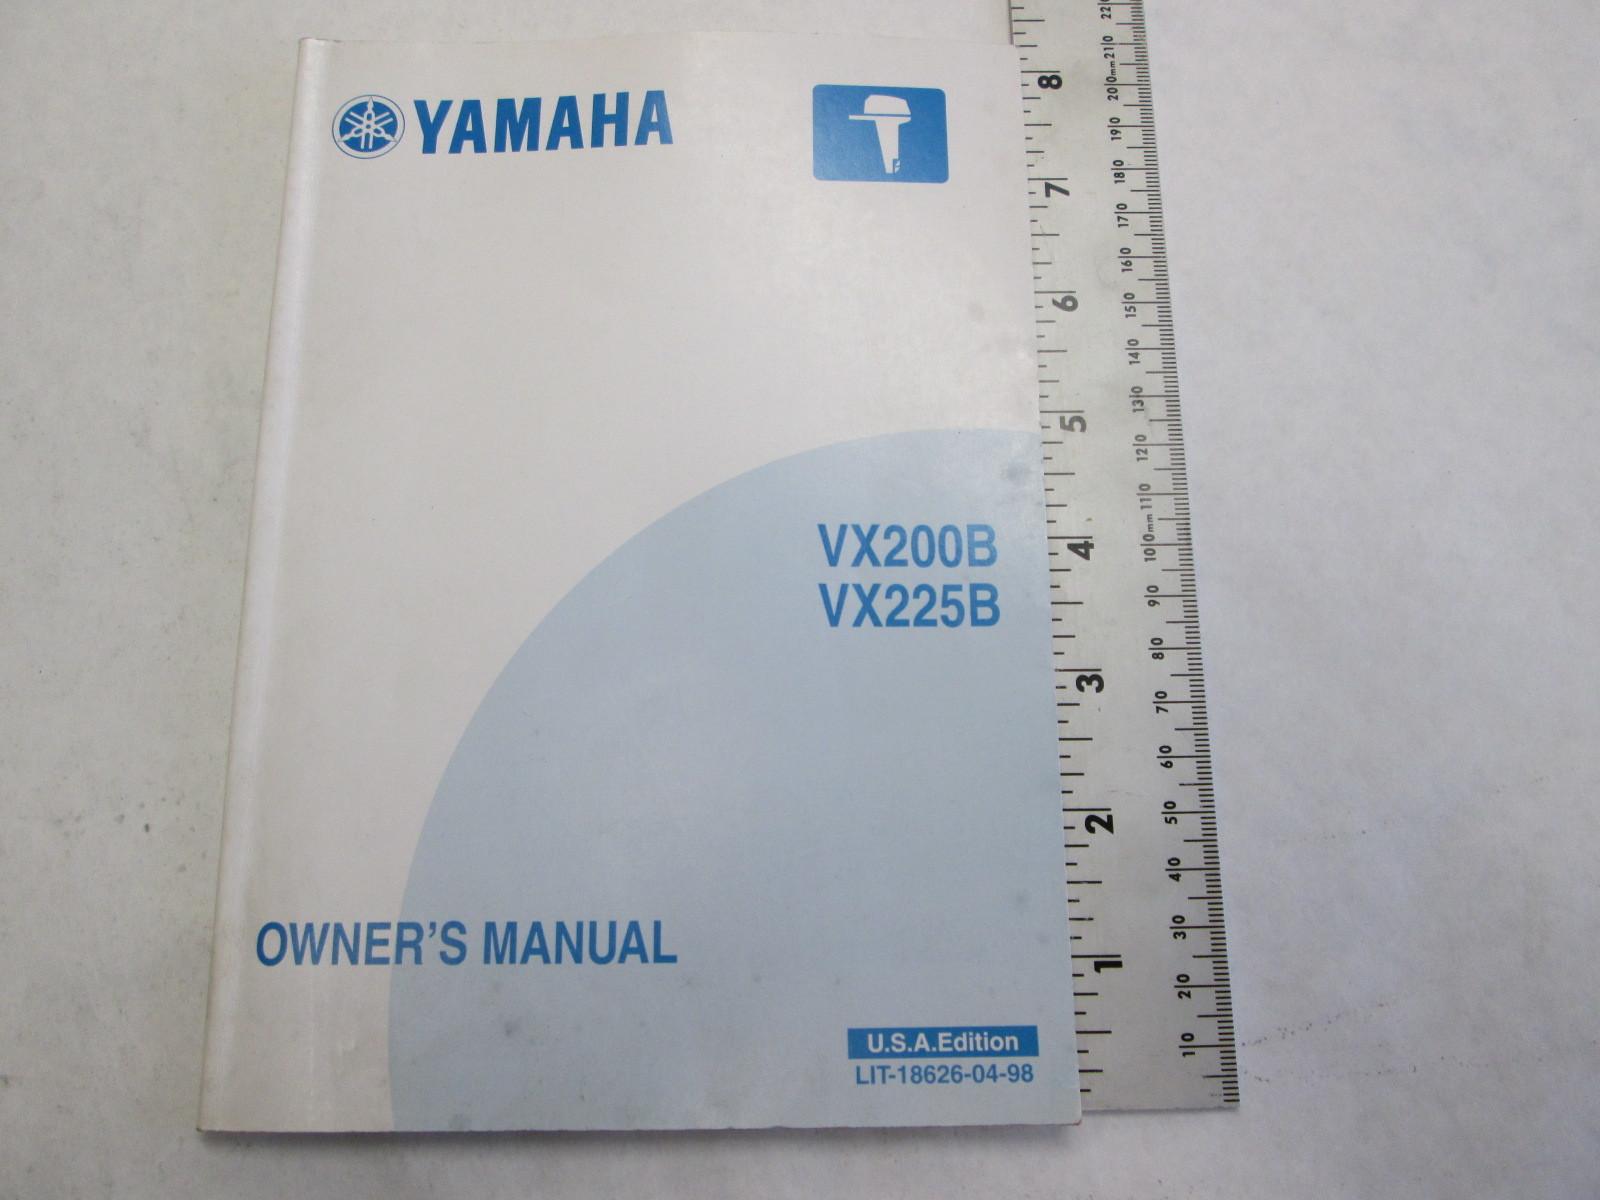 yamaha outboard vx200b vx225b owner s manual lit 18626 04 98 green rh greenbayprop com yamaha outboard owners manual for 2016 f40 yamaha outboard owner manual 2007 f250 hp